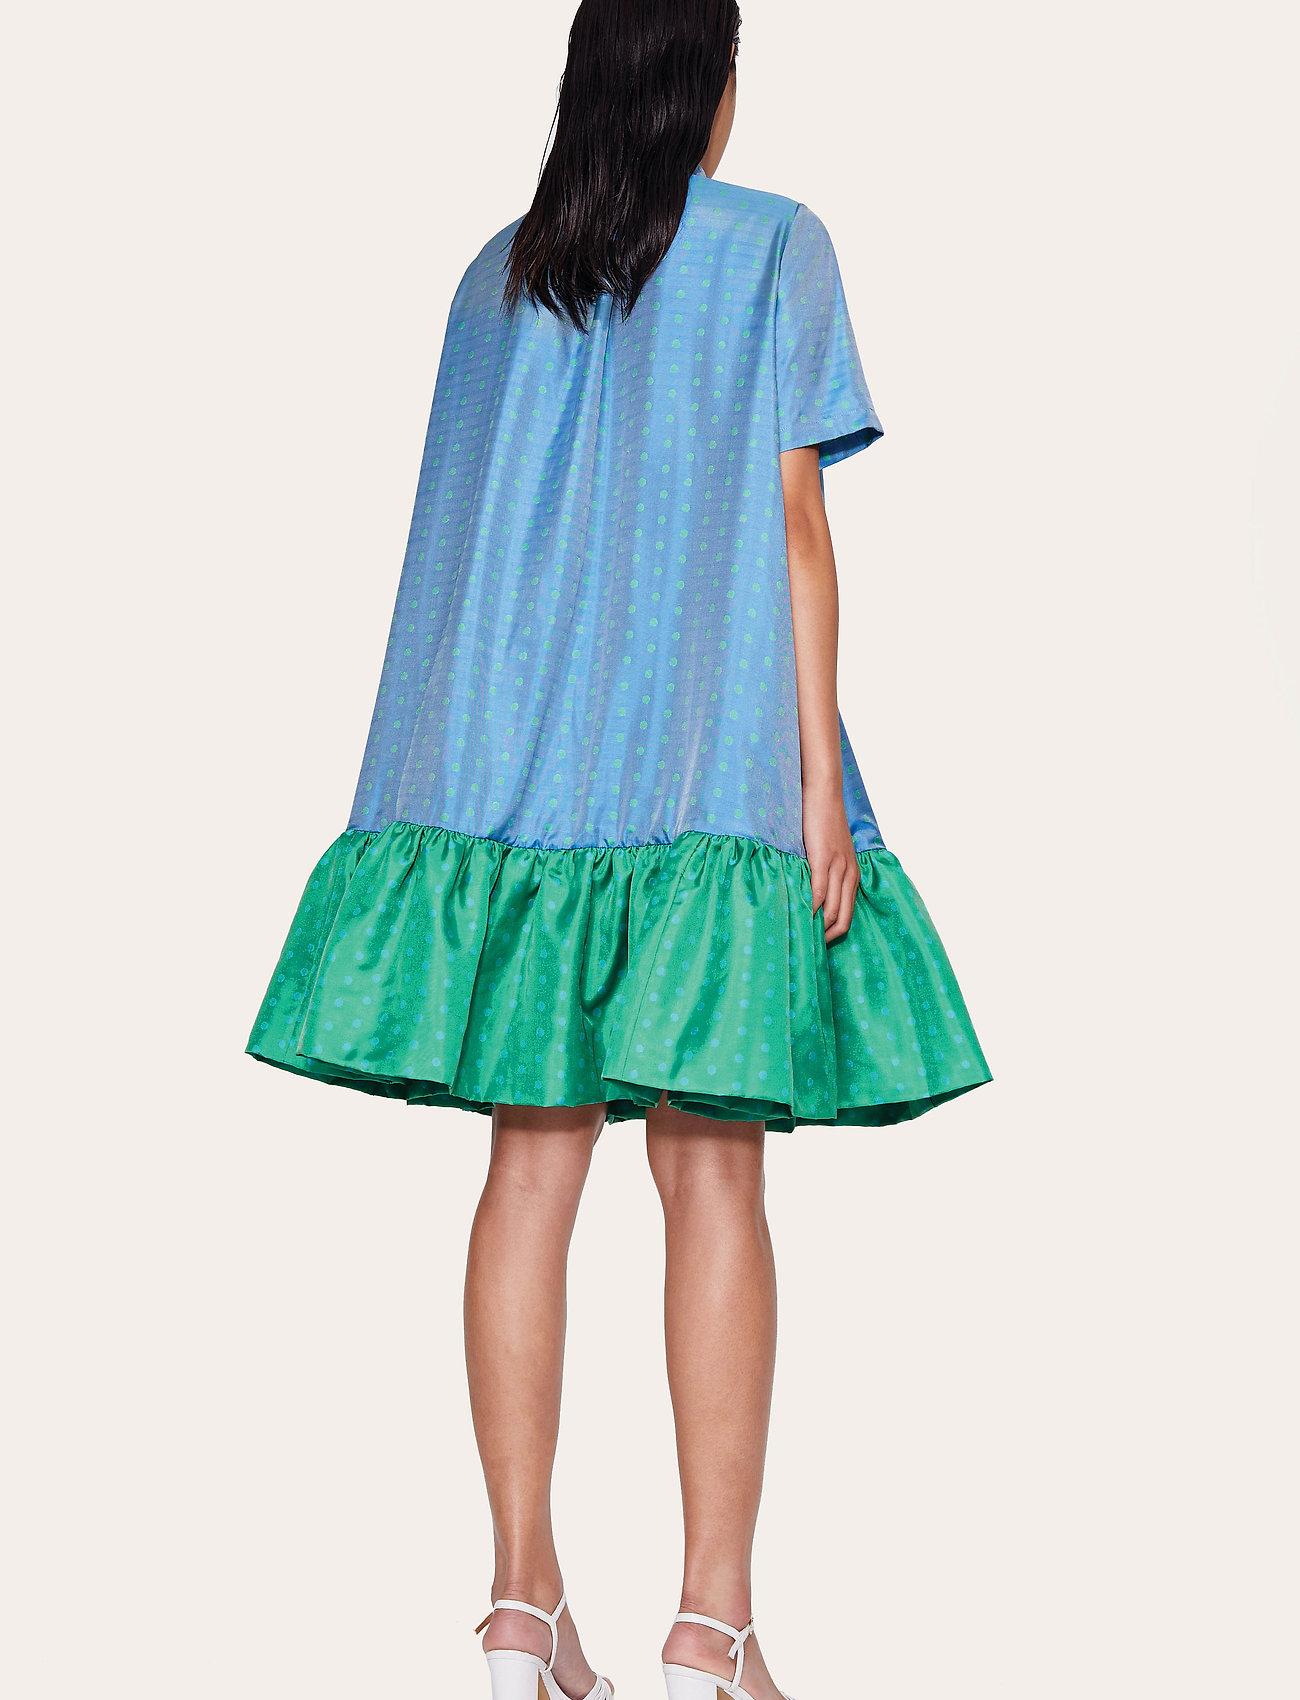 STINE GOYA - Wendy, 870 Green Blue Dots - midiklänningar - blue green - 3